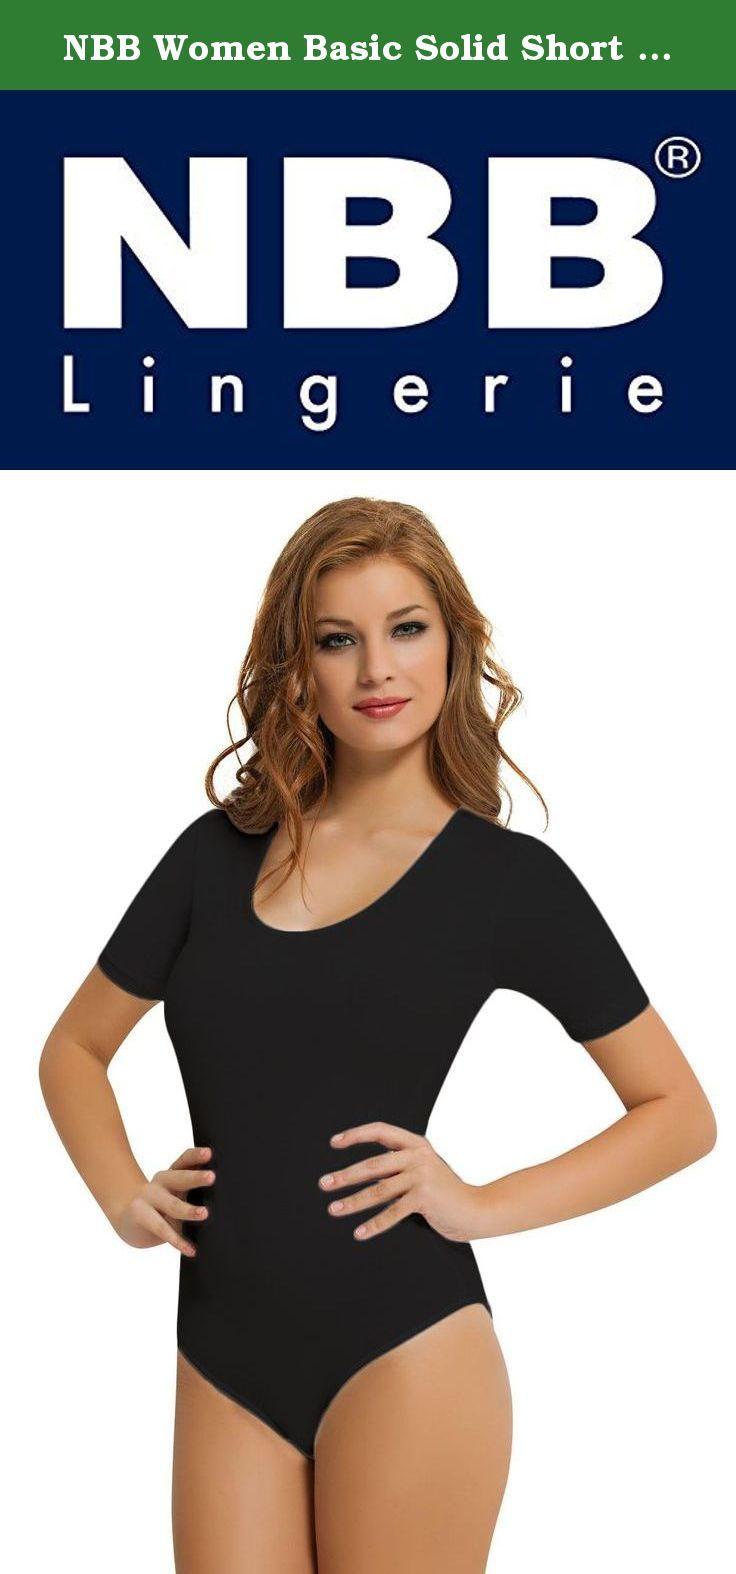 c102ce6c50 NBB Women Basic Solid Short Sleeve Scoop Neck Cotton Hipster Bodysuit  Lingerie